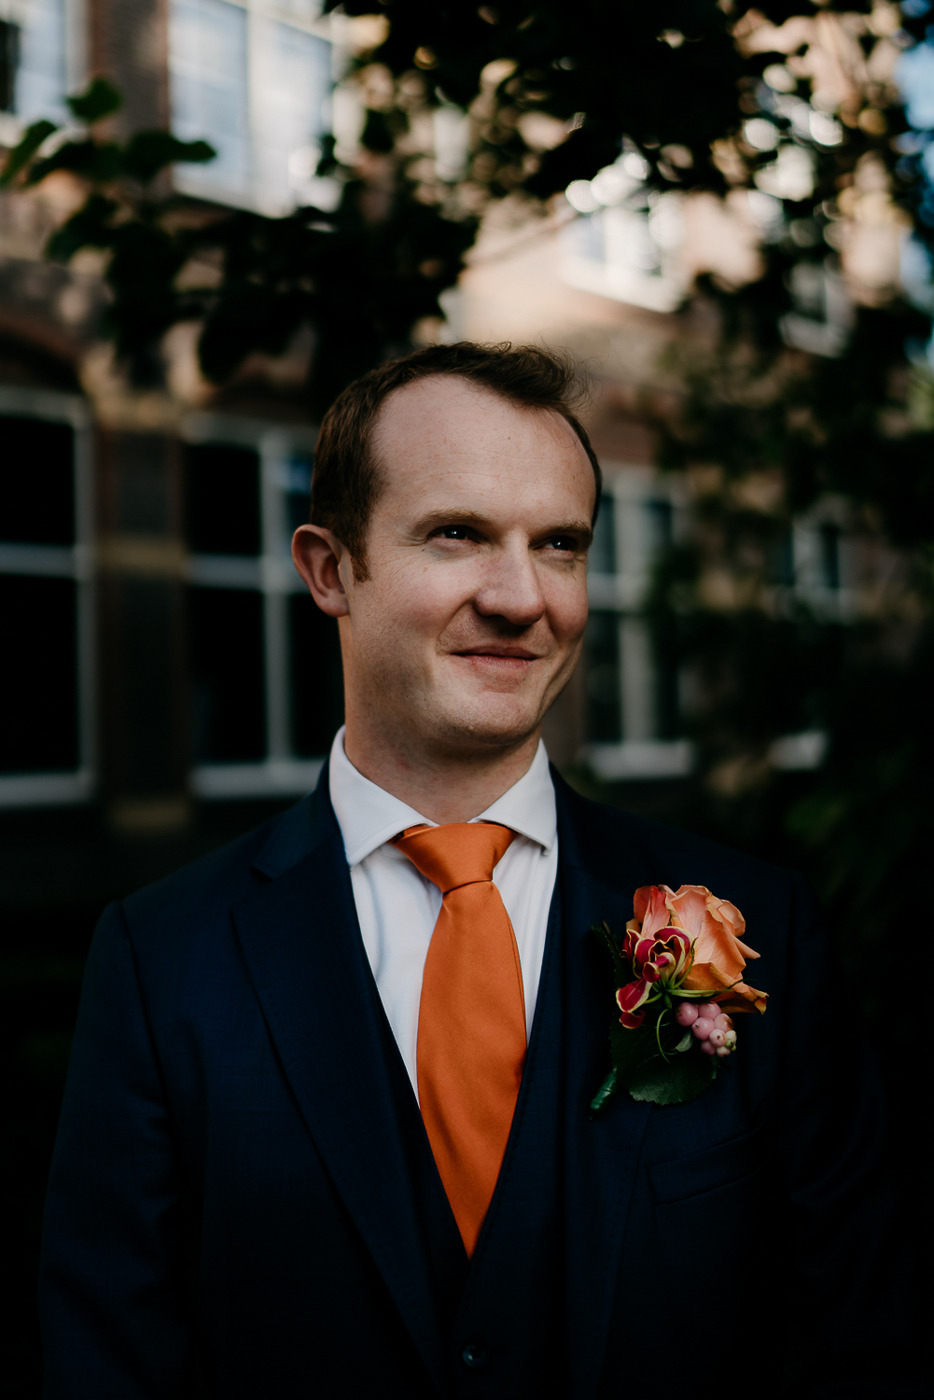 bruidsfotografie-trouwfotograaf-wedding-photographer-amsterdam-James-Jantine-259.jpg